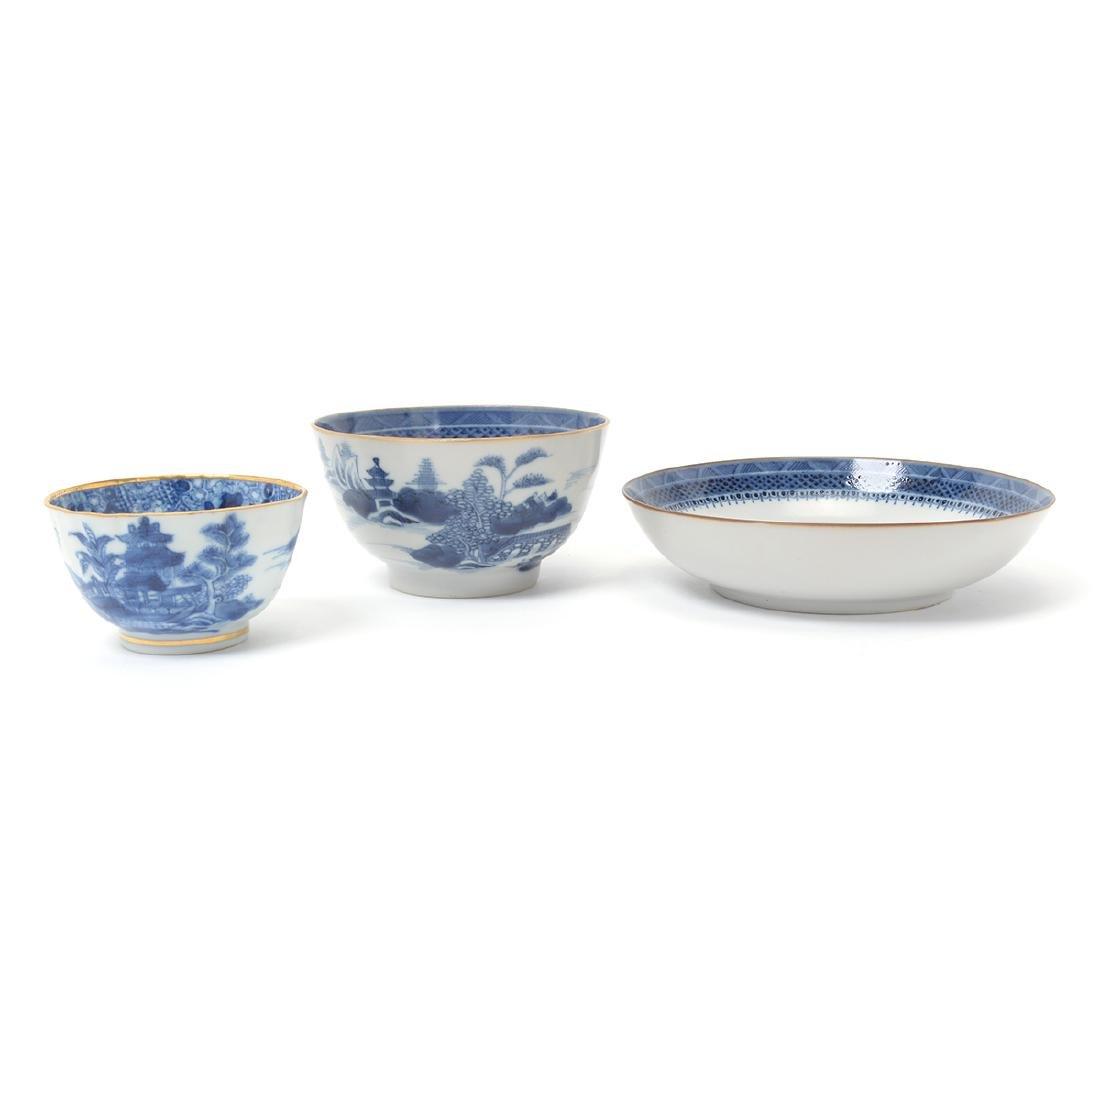 Three Chinese Export Underglaze Blue Porcelains